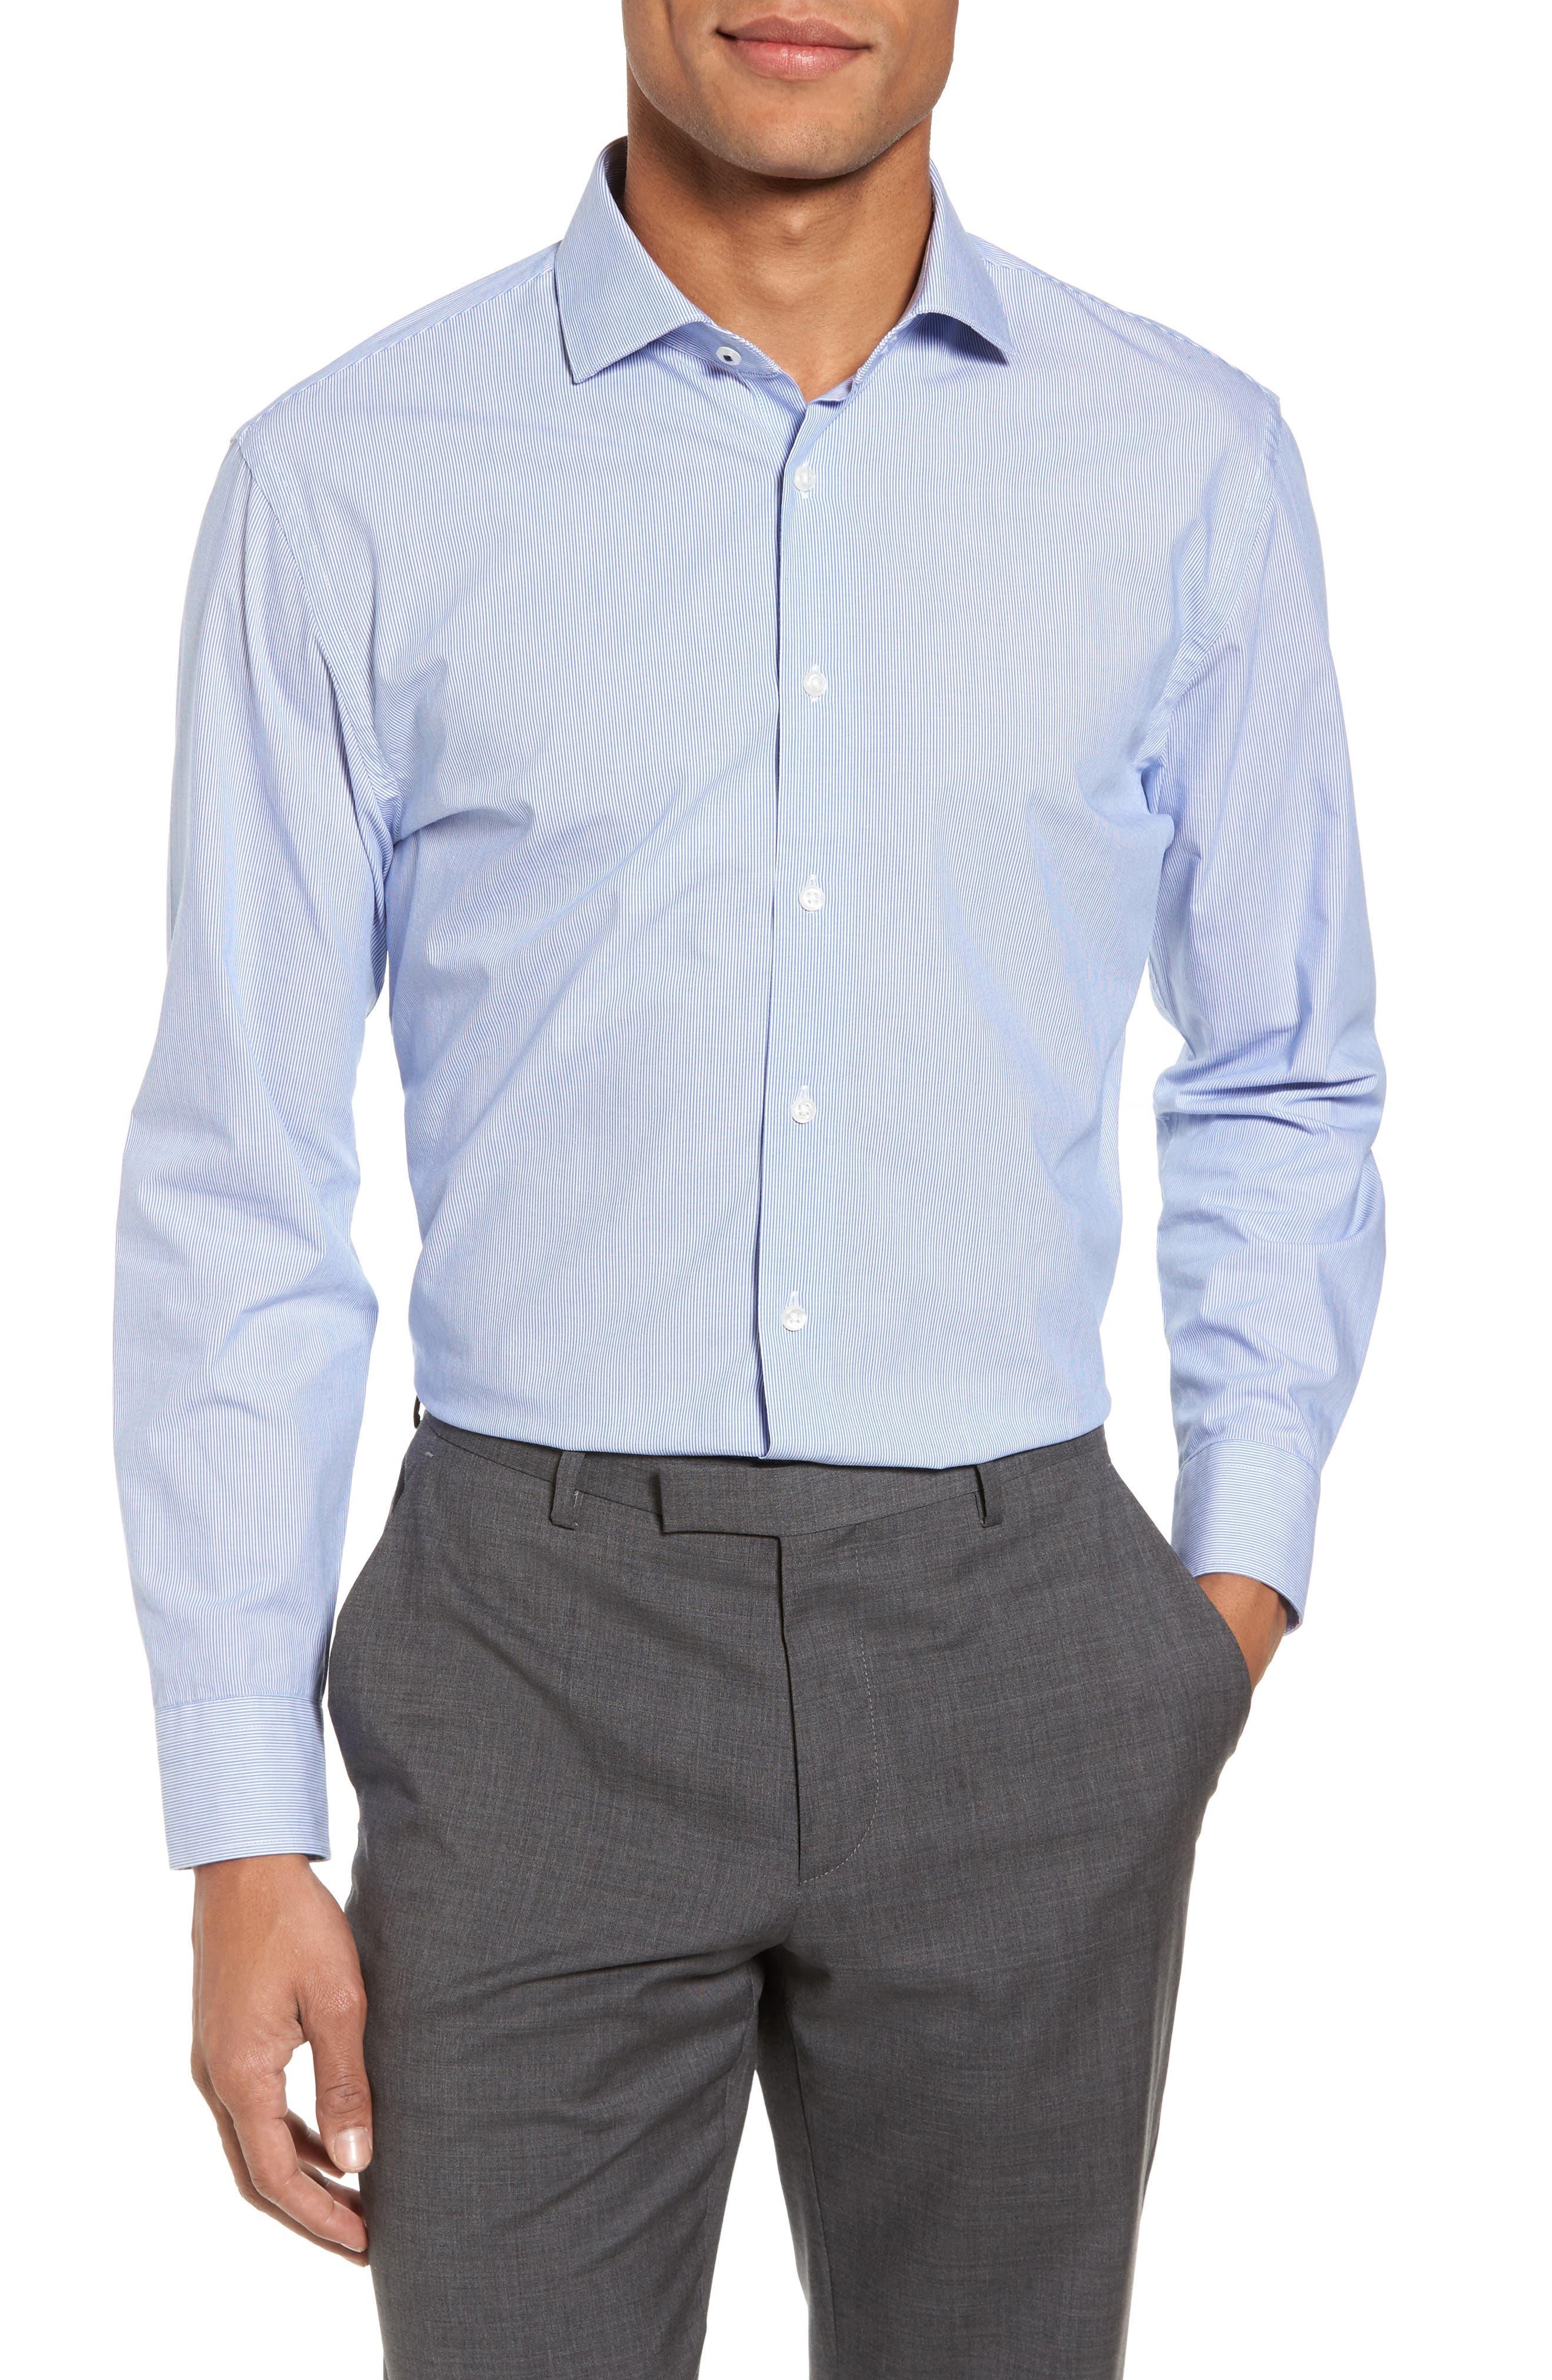 Nordstrom Men's Shop Tech-Smart Trim Fit Stretch Stripe Dress Shirt